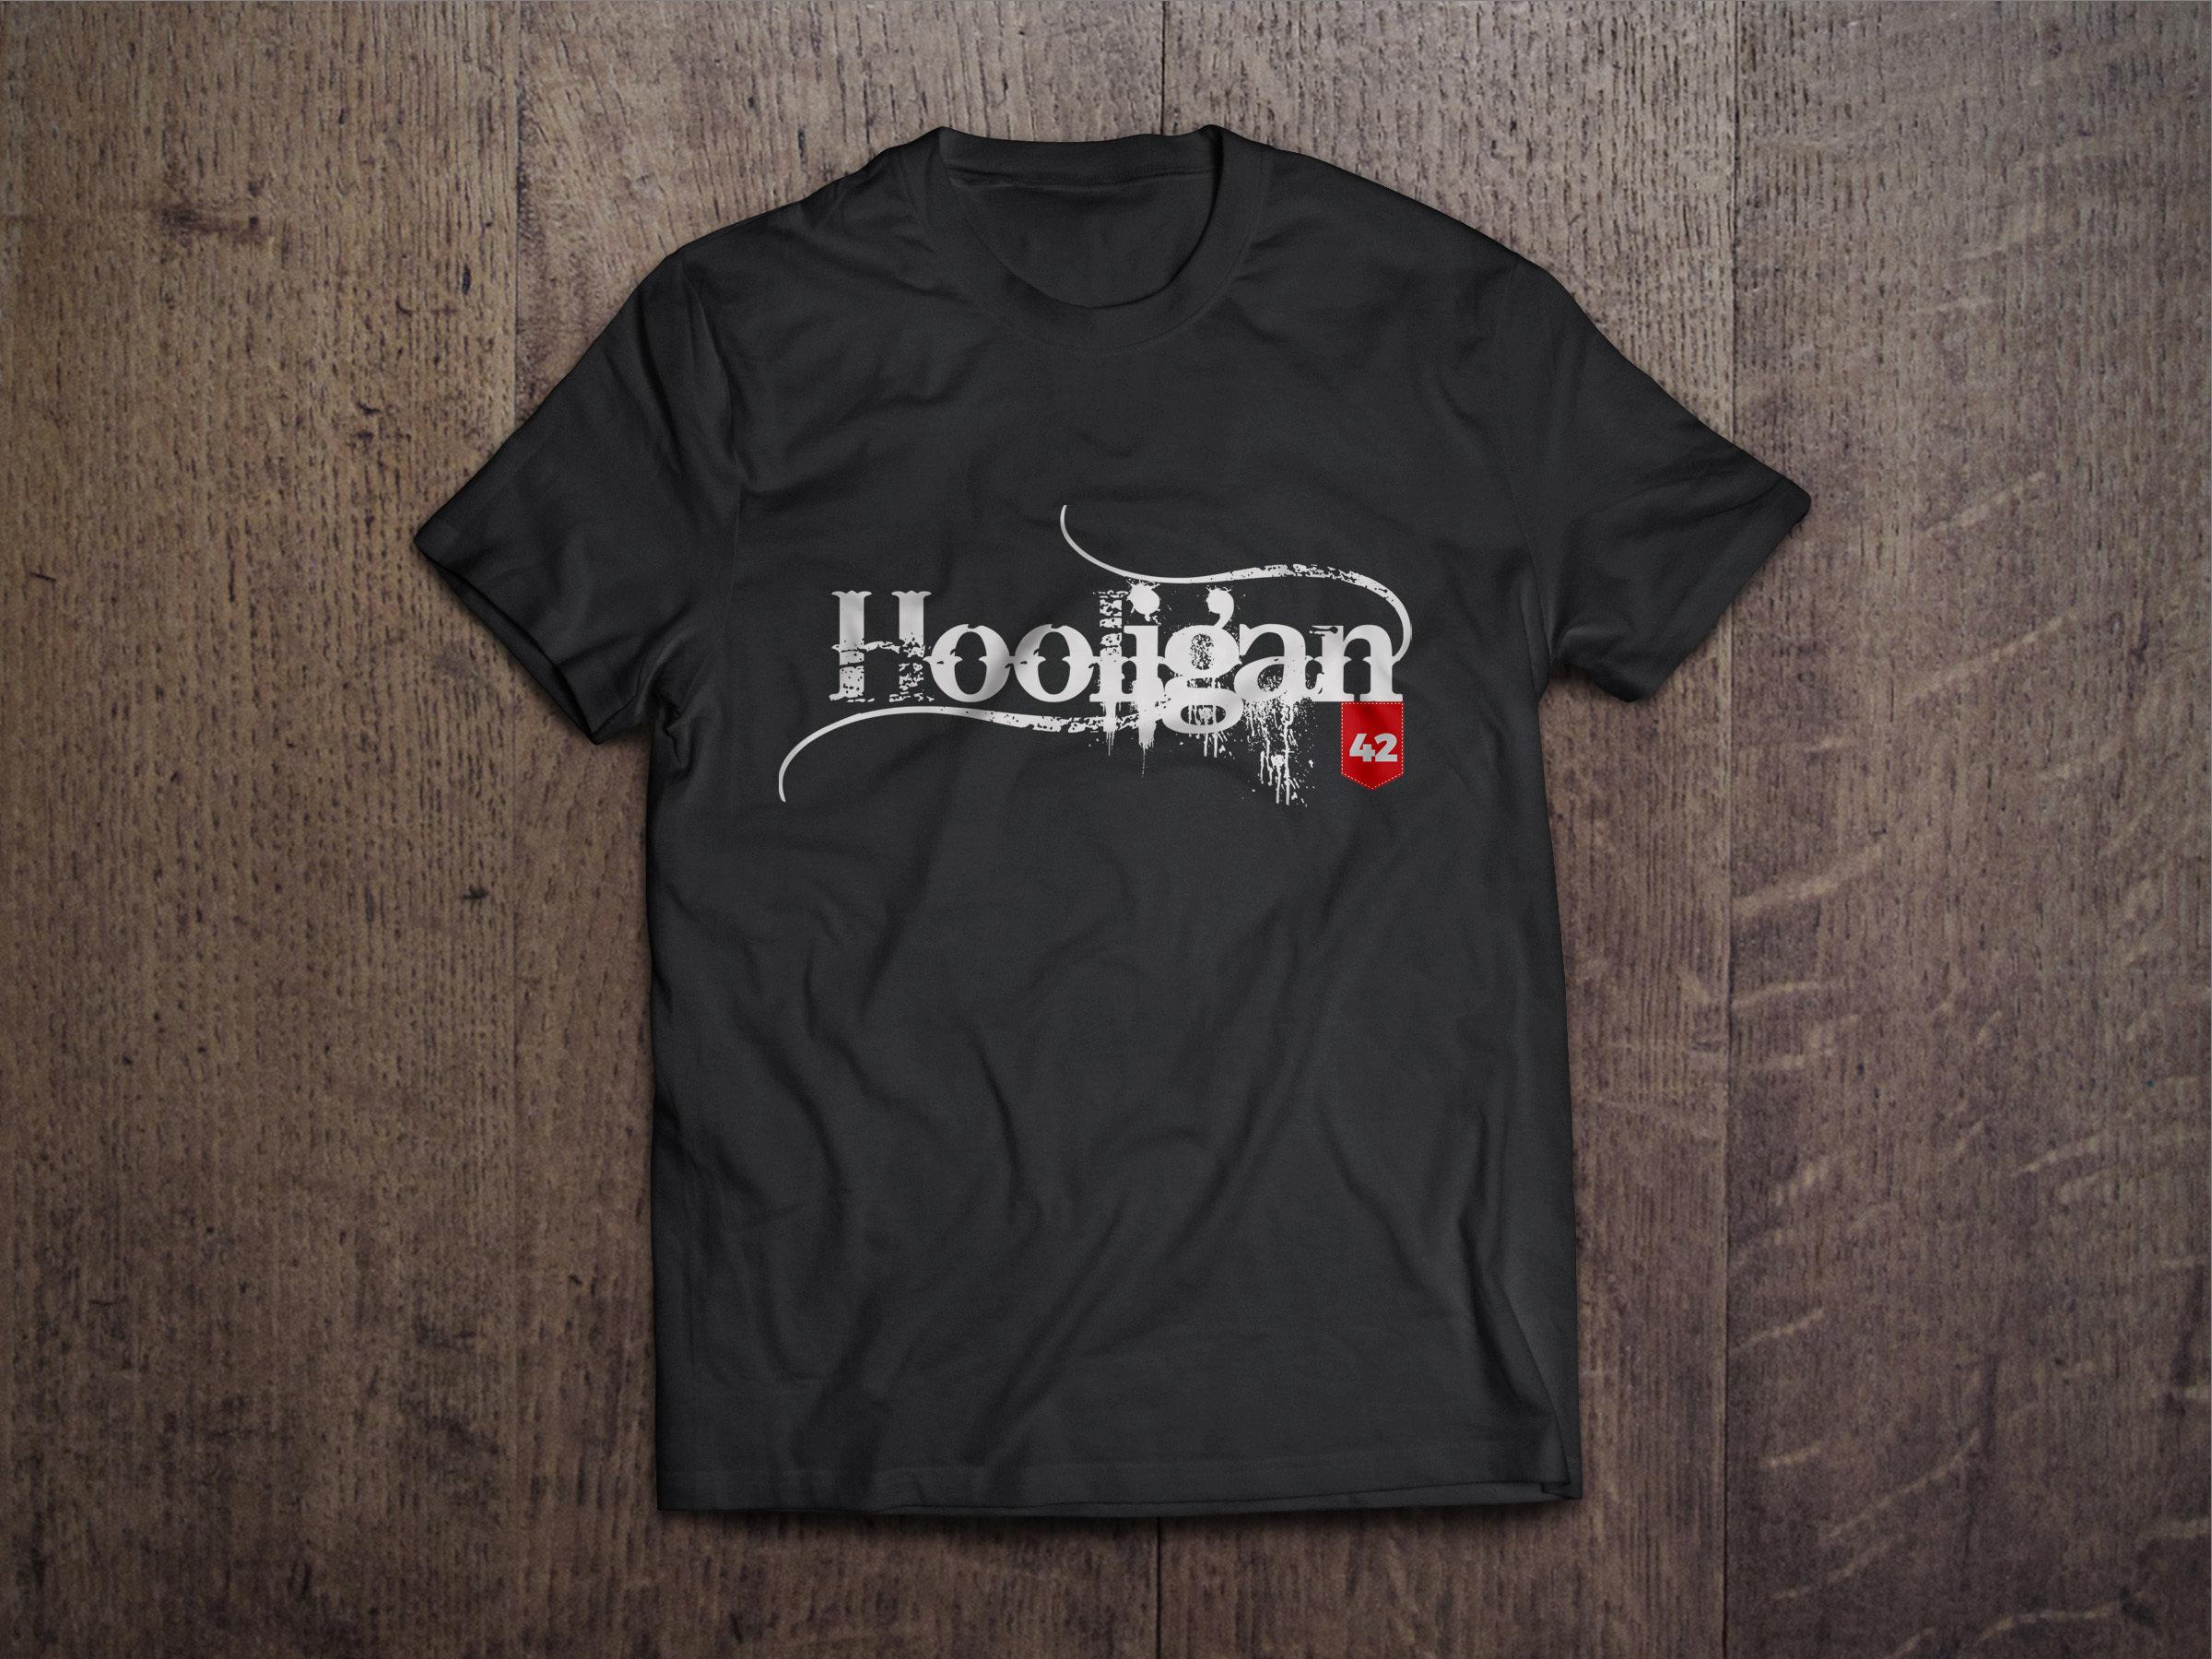 Hooligan Chest Candy Hooligan Tshirt